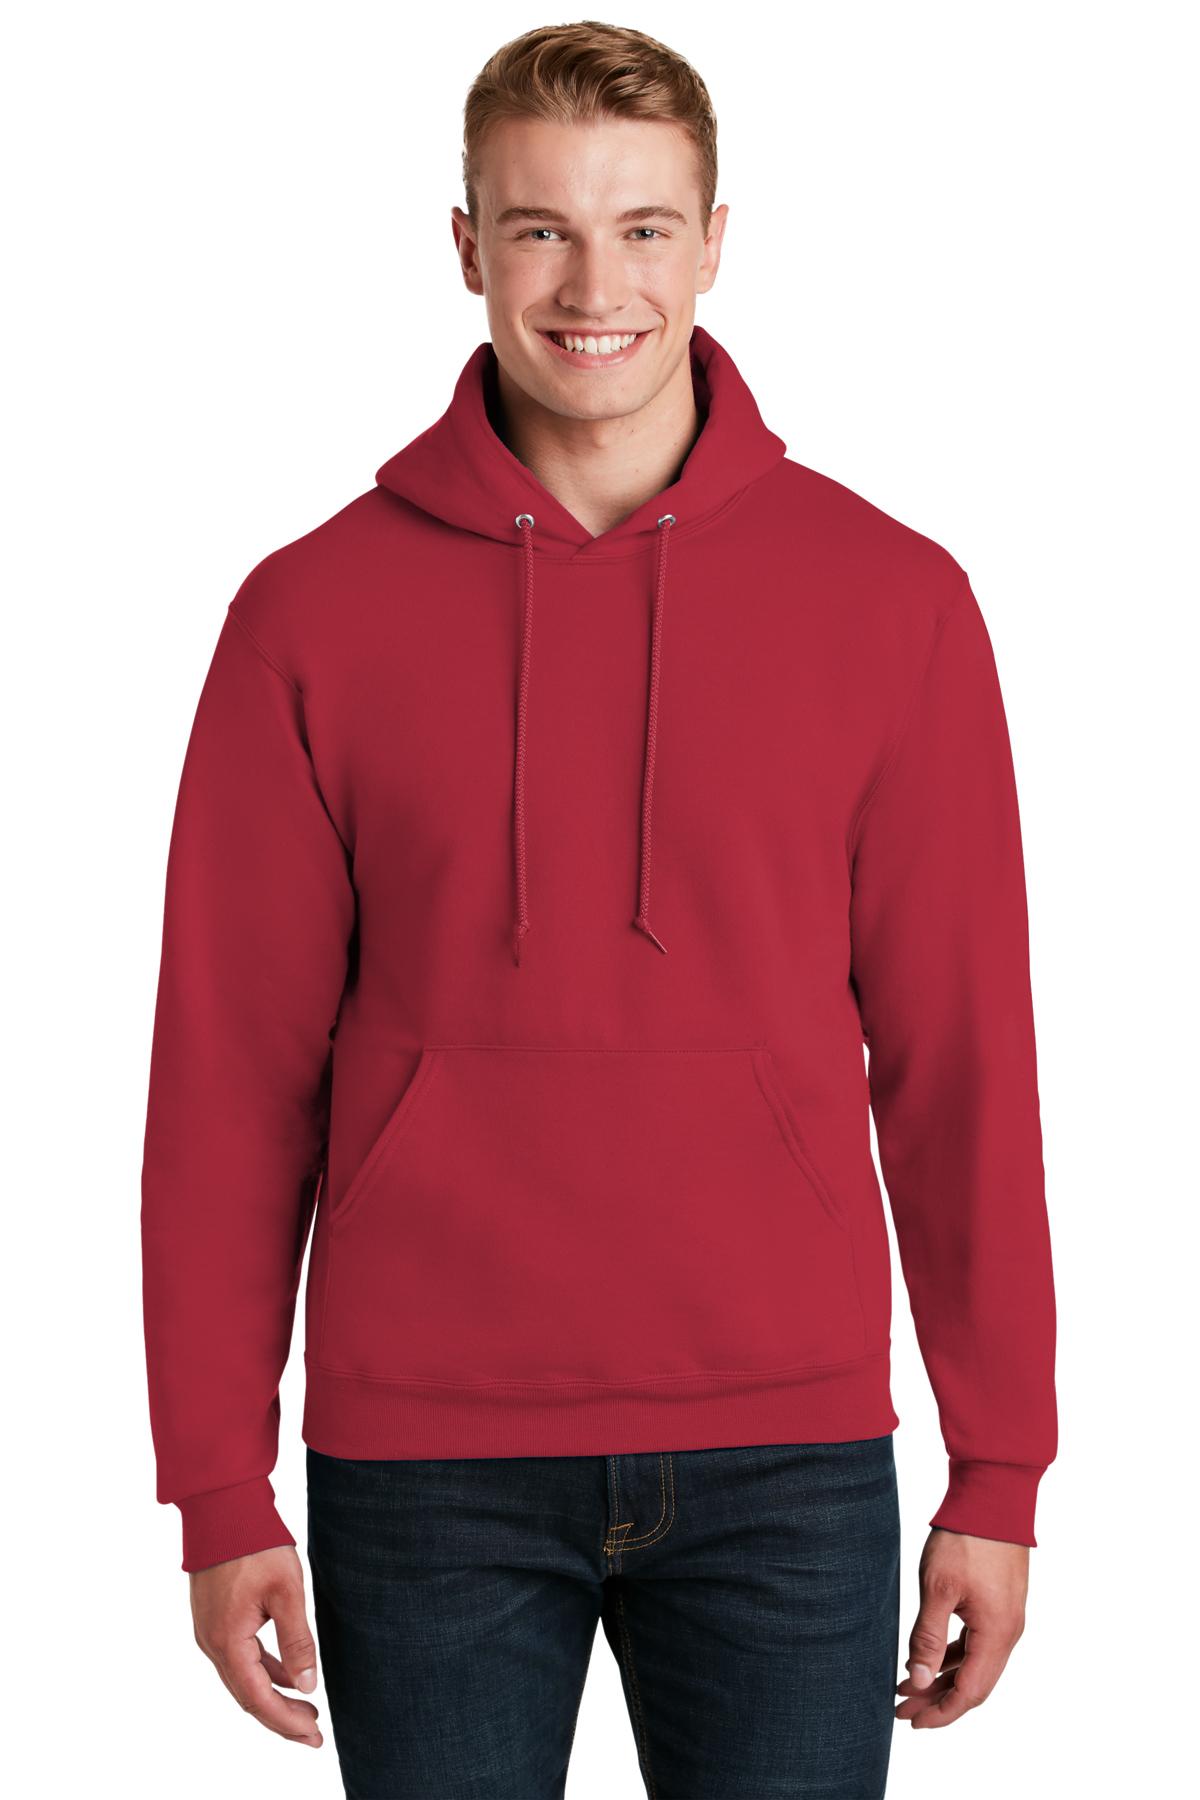 Custom Embroidered Mens Jerzees Hoody Sweatshirts!